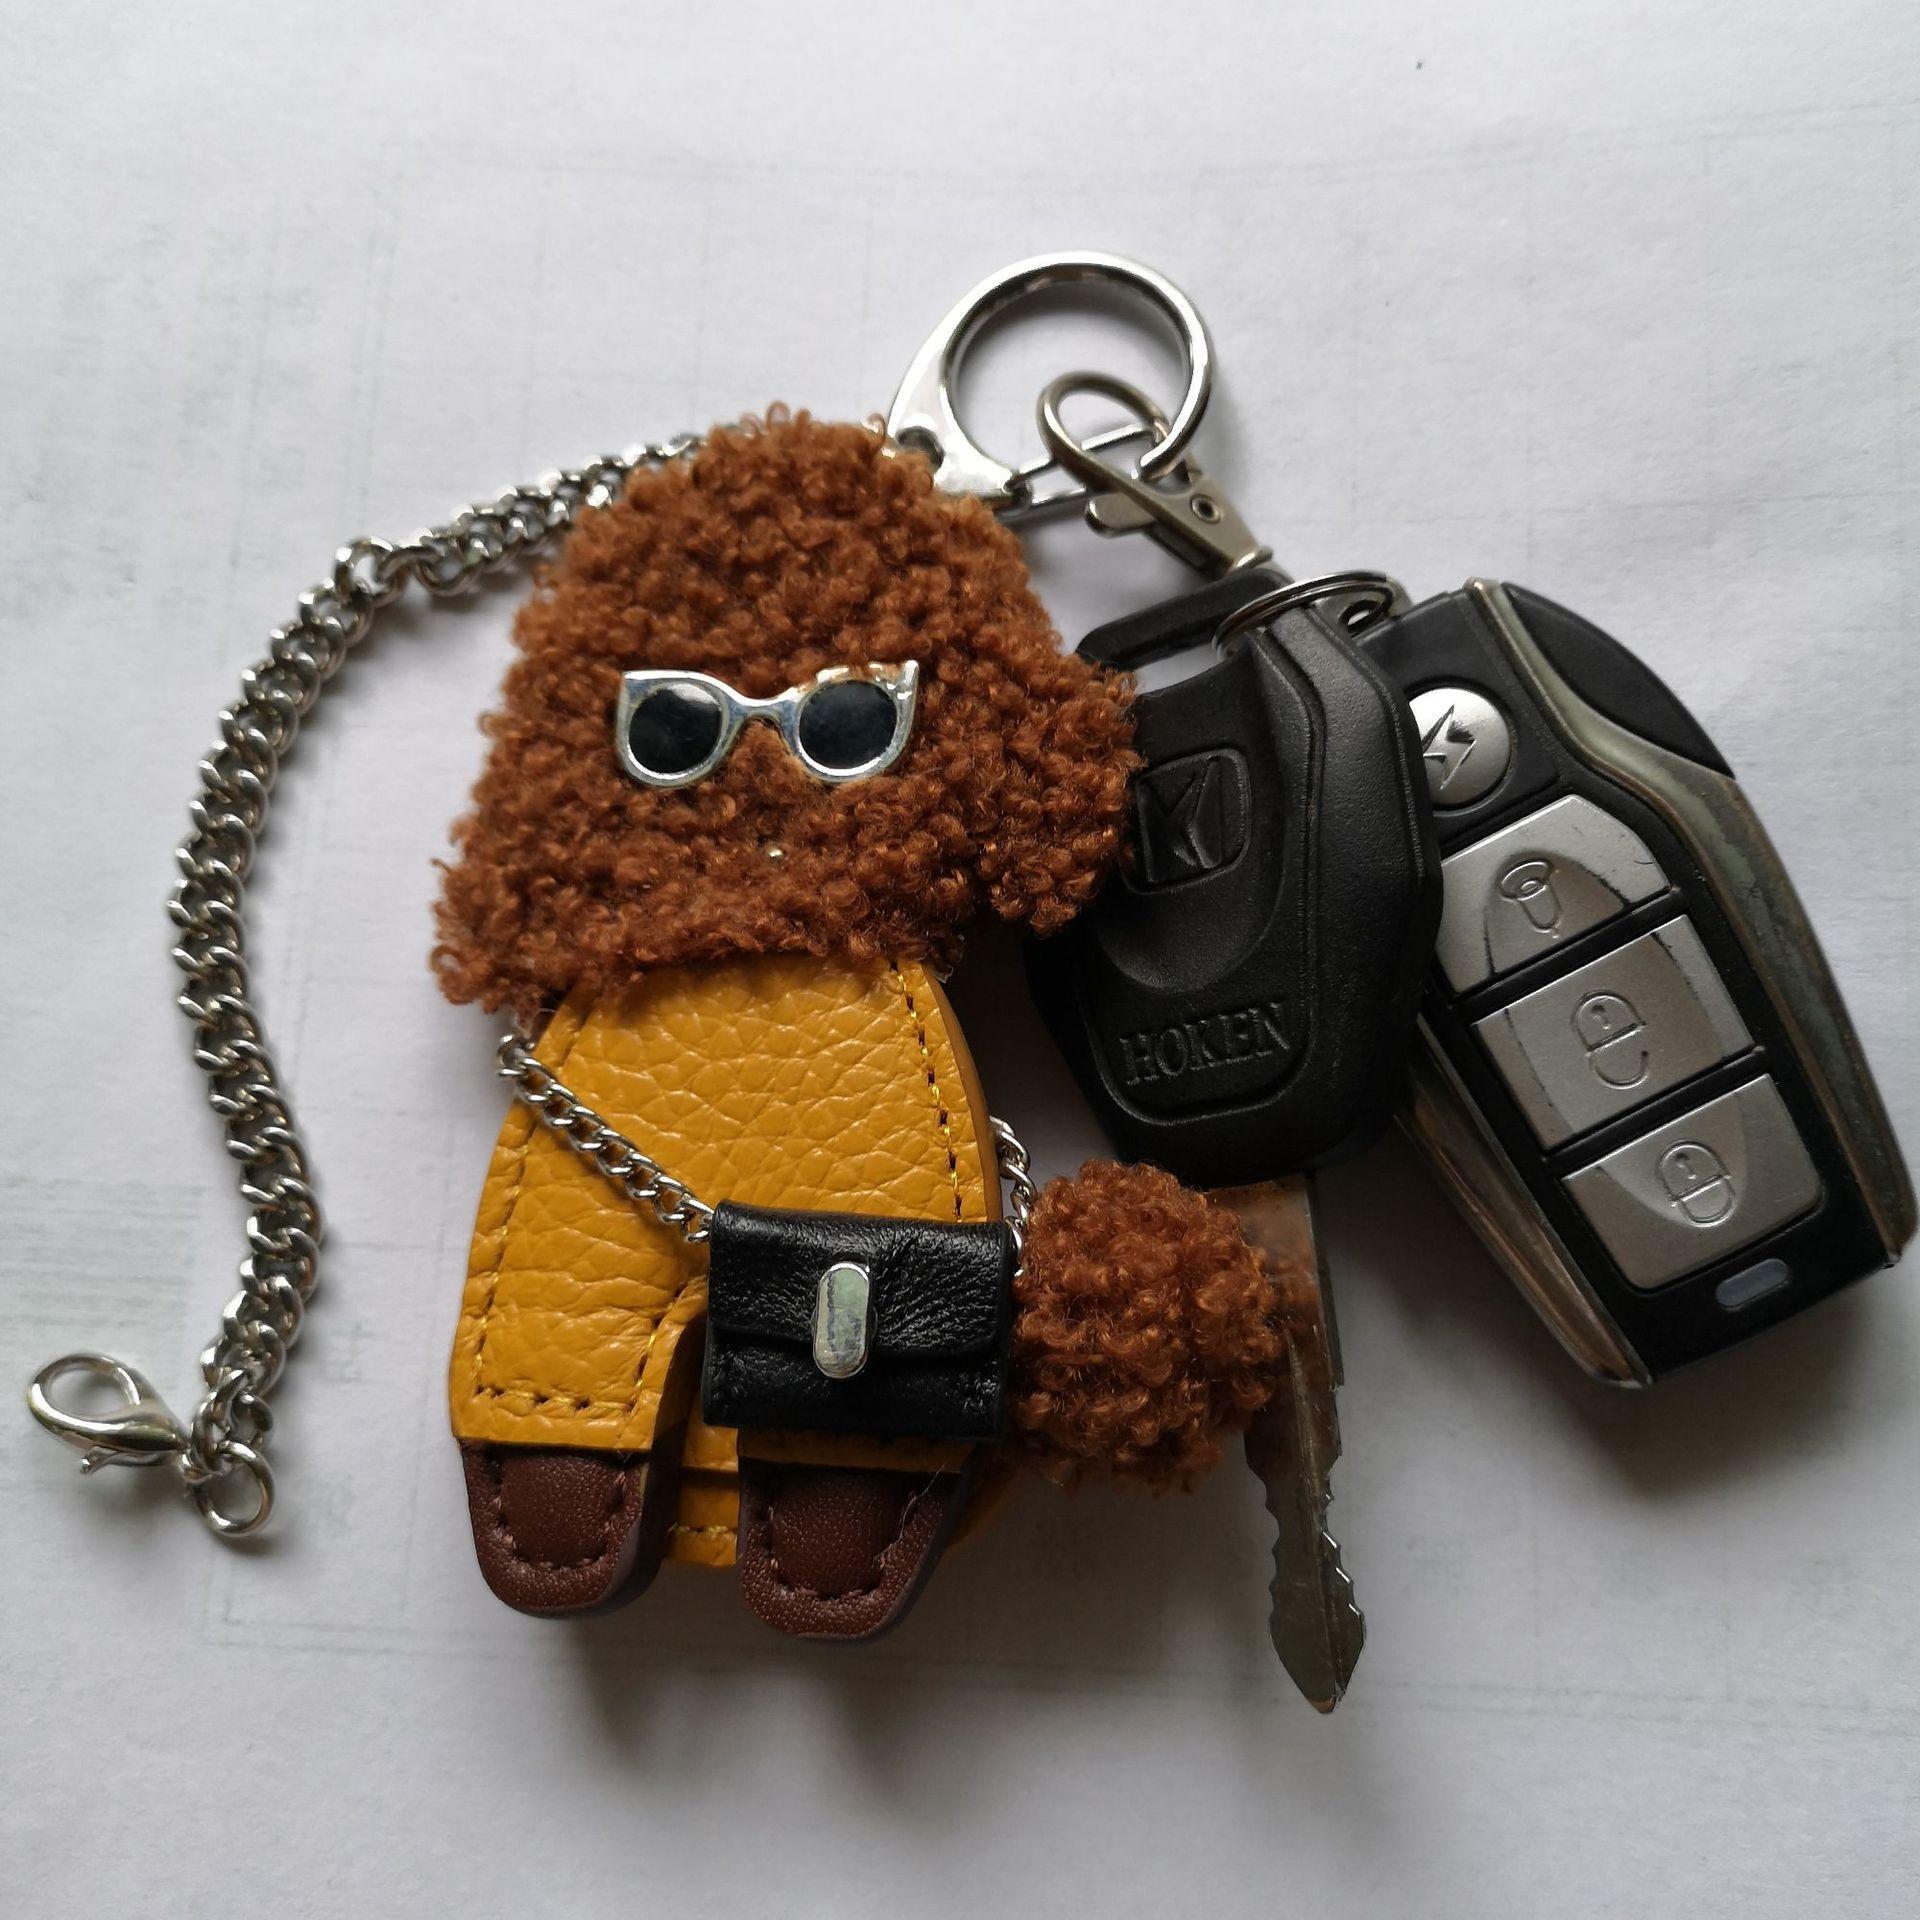 2019 Creative Leather Small Teddy Image Bags Colgante Pequeño Plush Leather Teddy Keychain Accesorios de Moda Juguetes Regalos